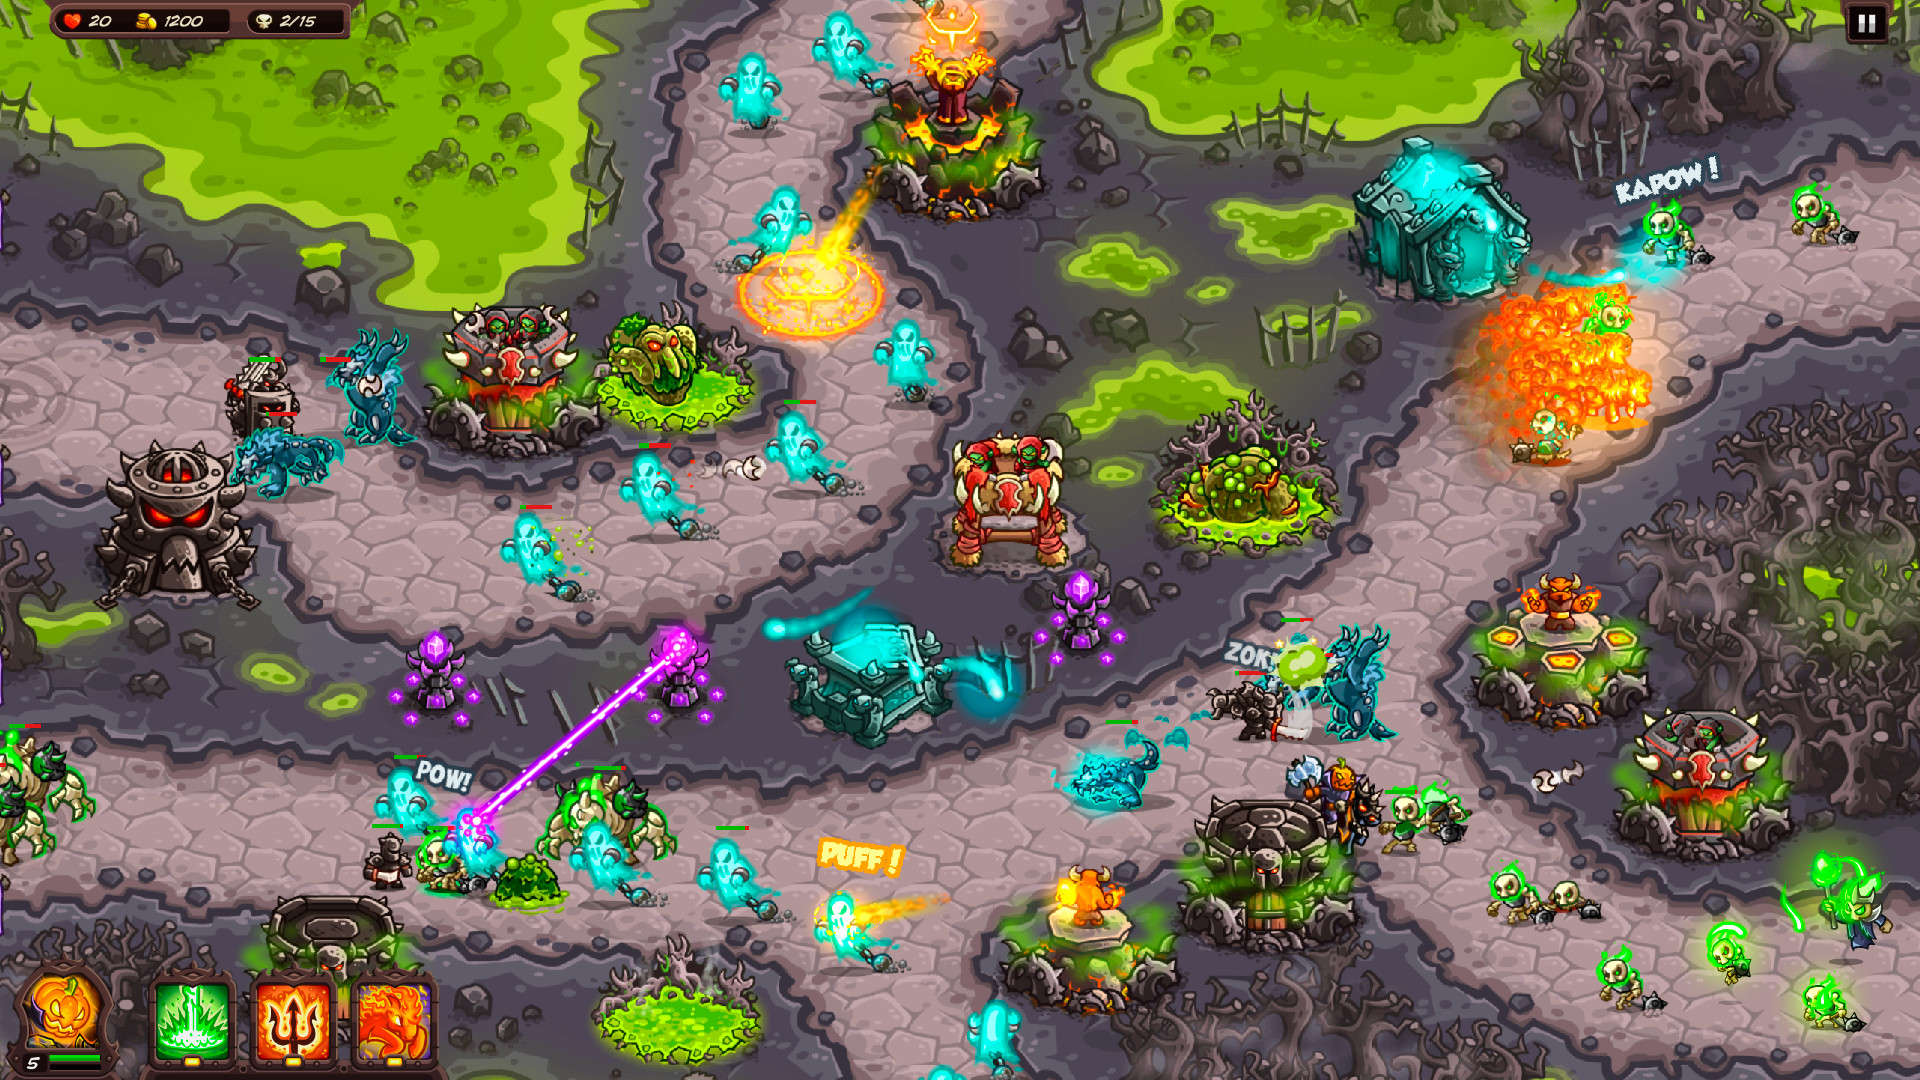 kingdom-rush-vengeance-pc-screenshot-4